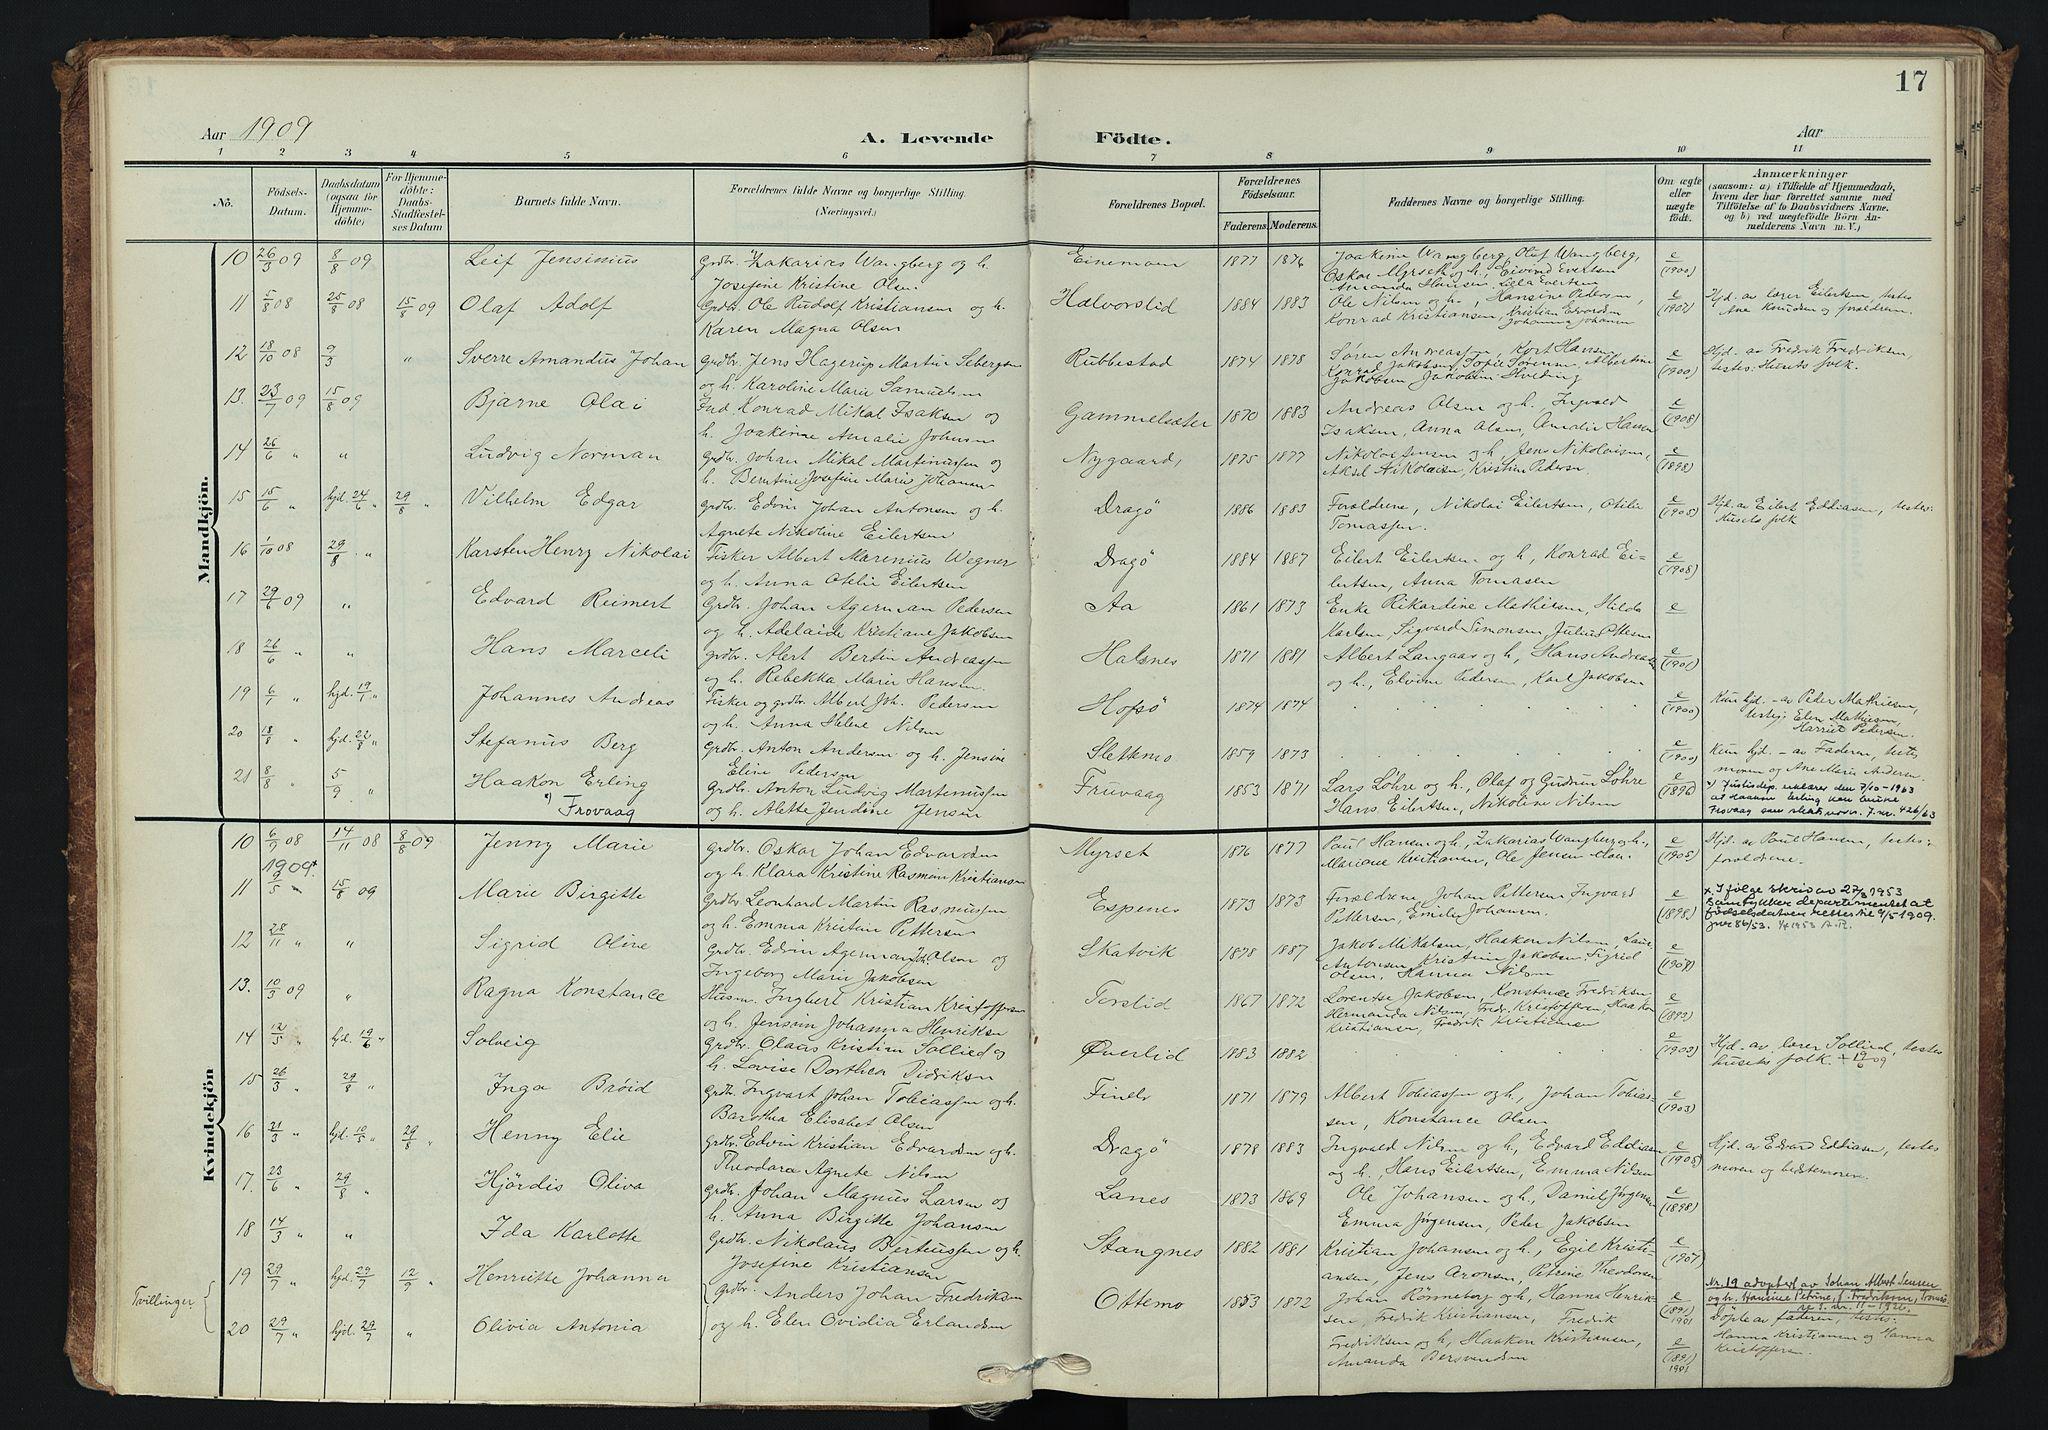 SATØ, Tranøy sokneprestkontor, I/Ia/Iaa/L0014kirke: Ministerialbok nr. 14, 1905-1919, s. 17